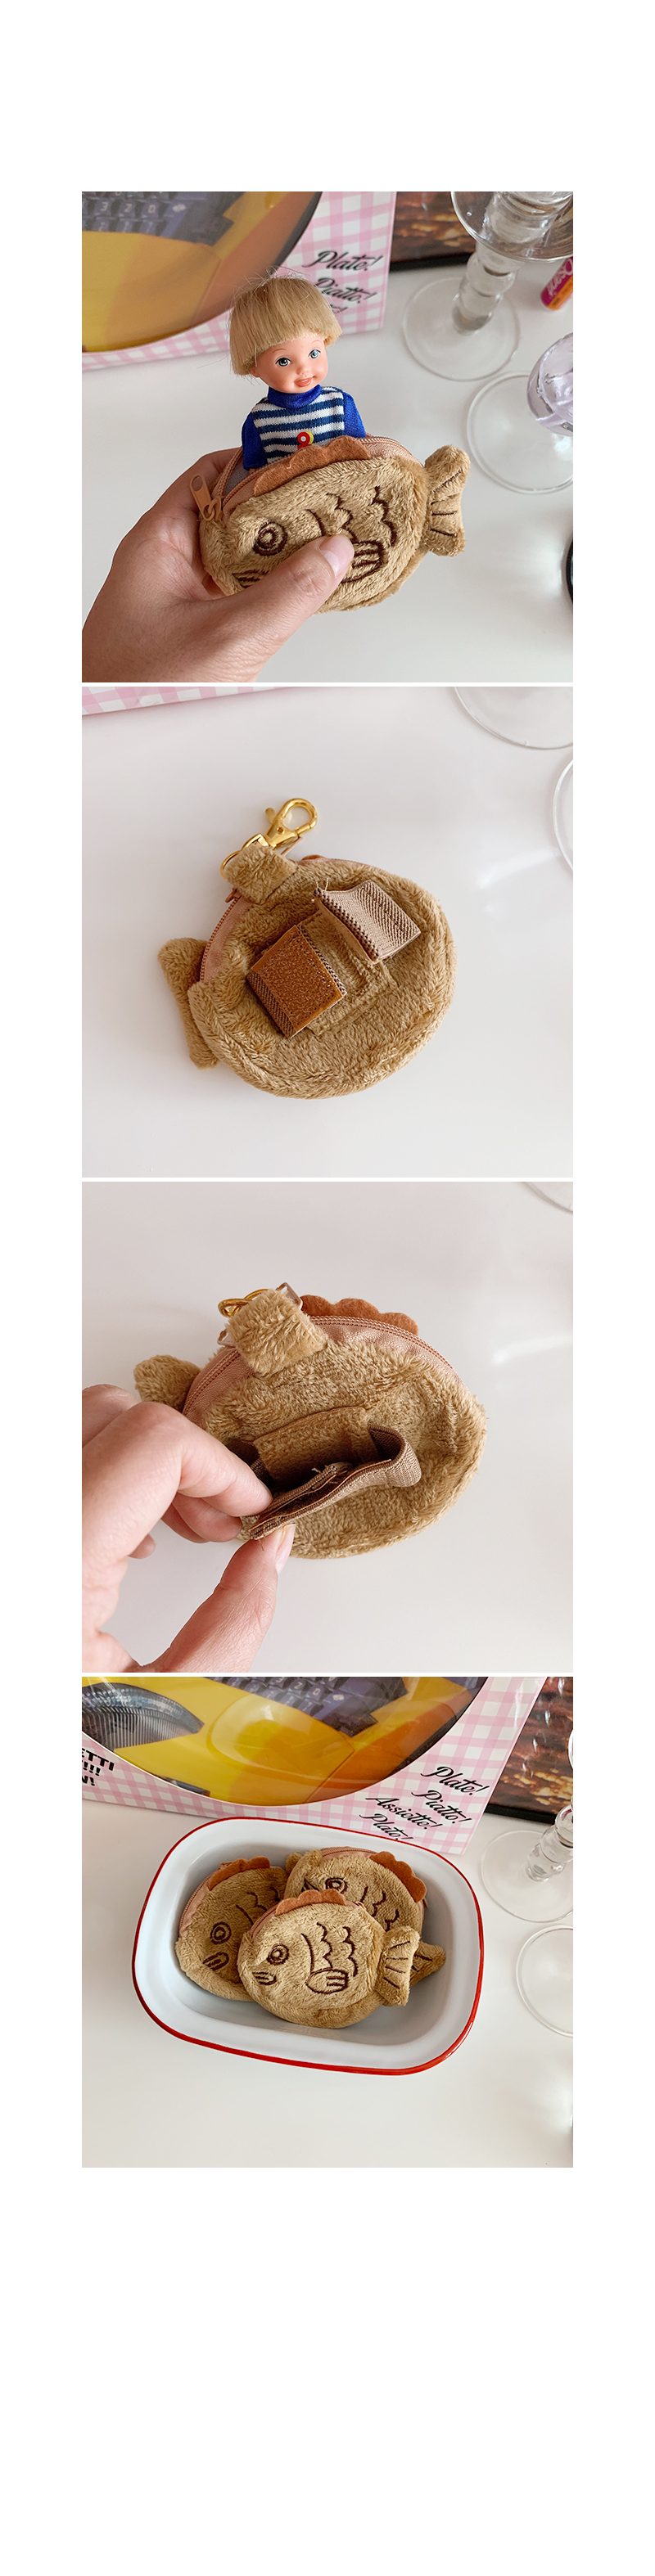 Fish Bread Pouch 붕어빵파우치 - 메종드알로하, 6,000원, 다용도파우치, 지퍼형